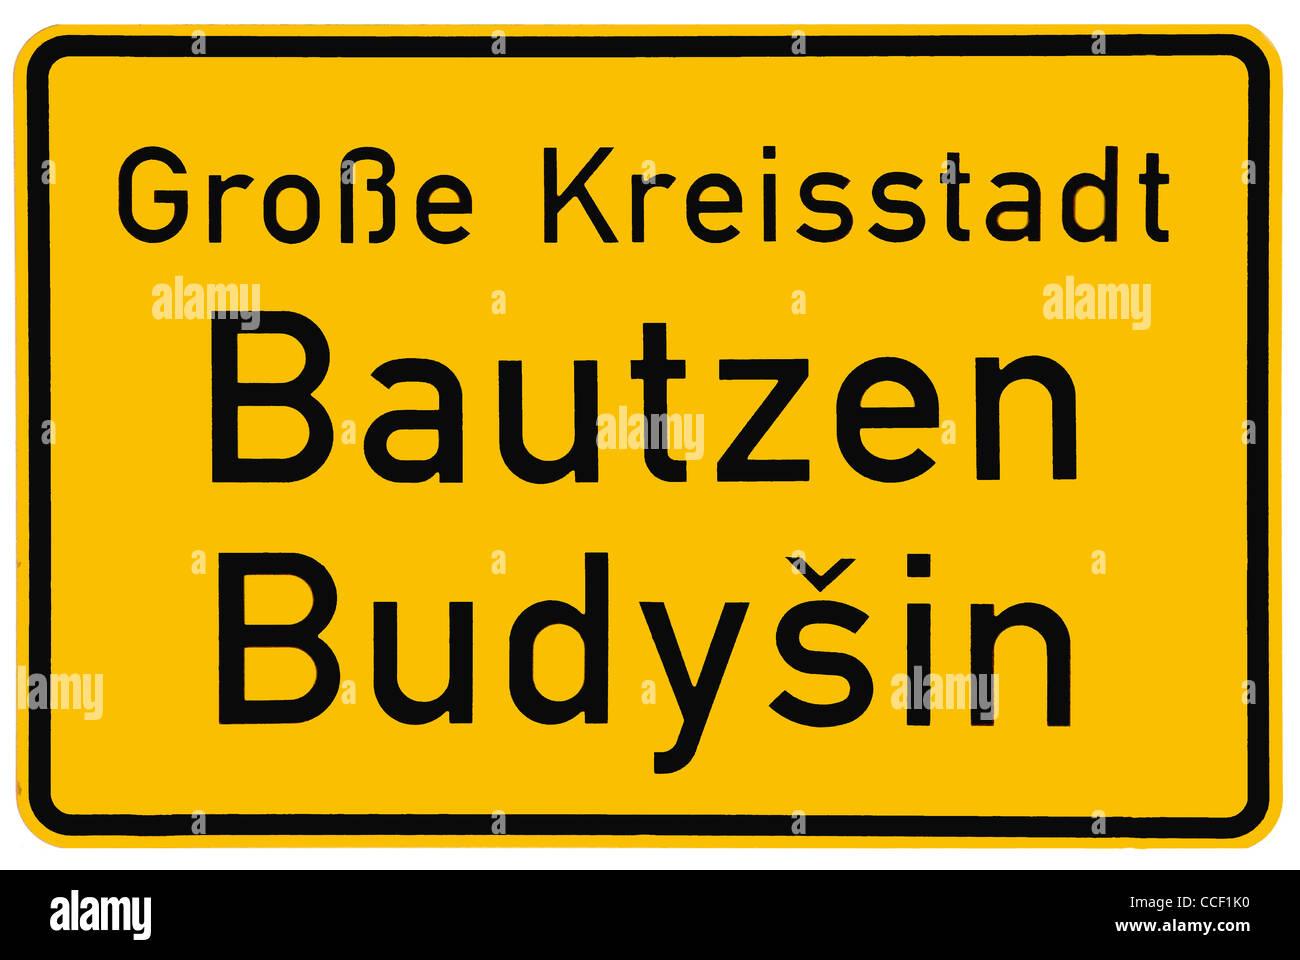 City sign of Bautzen in German and Sorbian language. - Stock Image